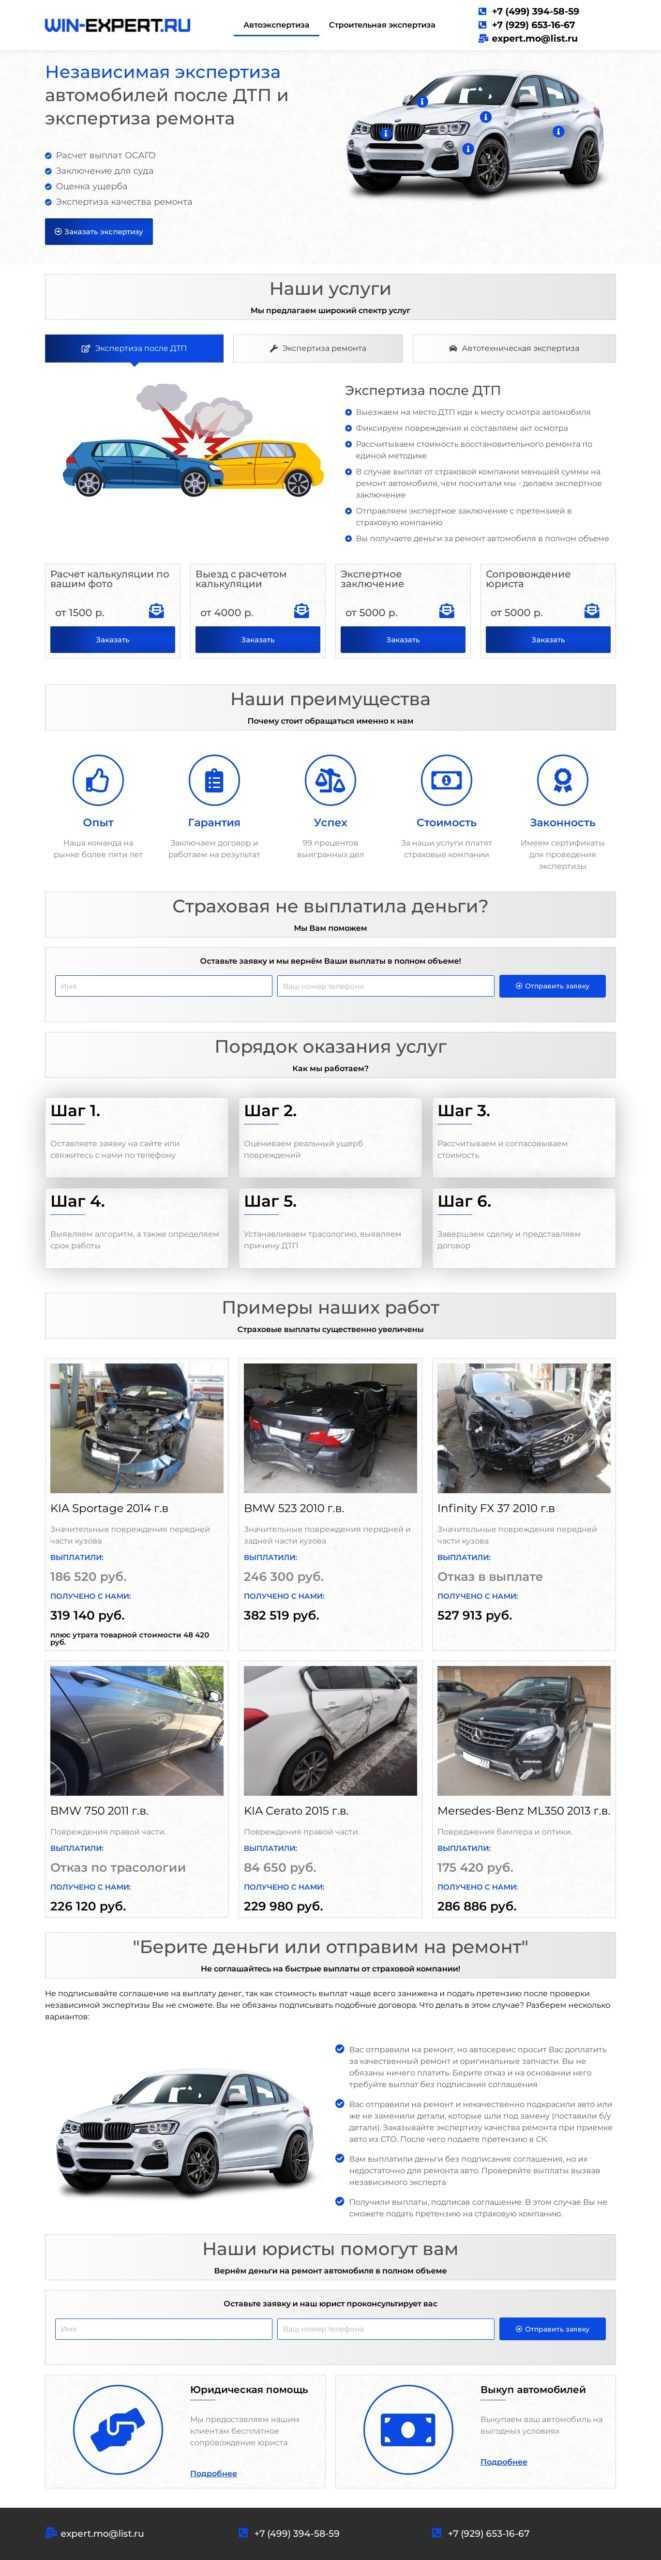 win-expert.ru